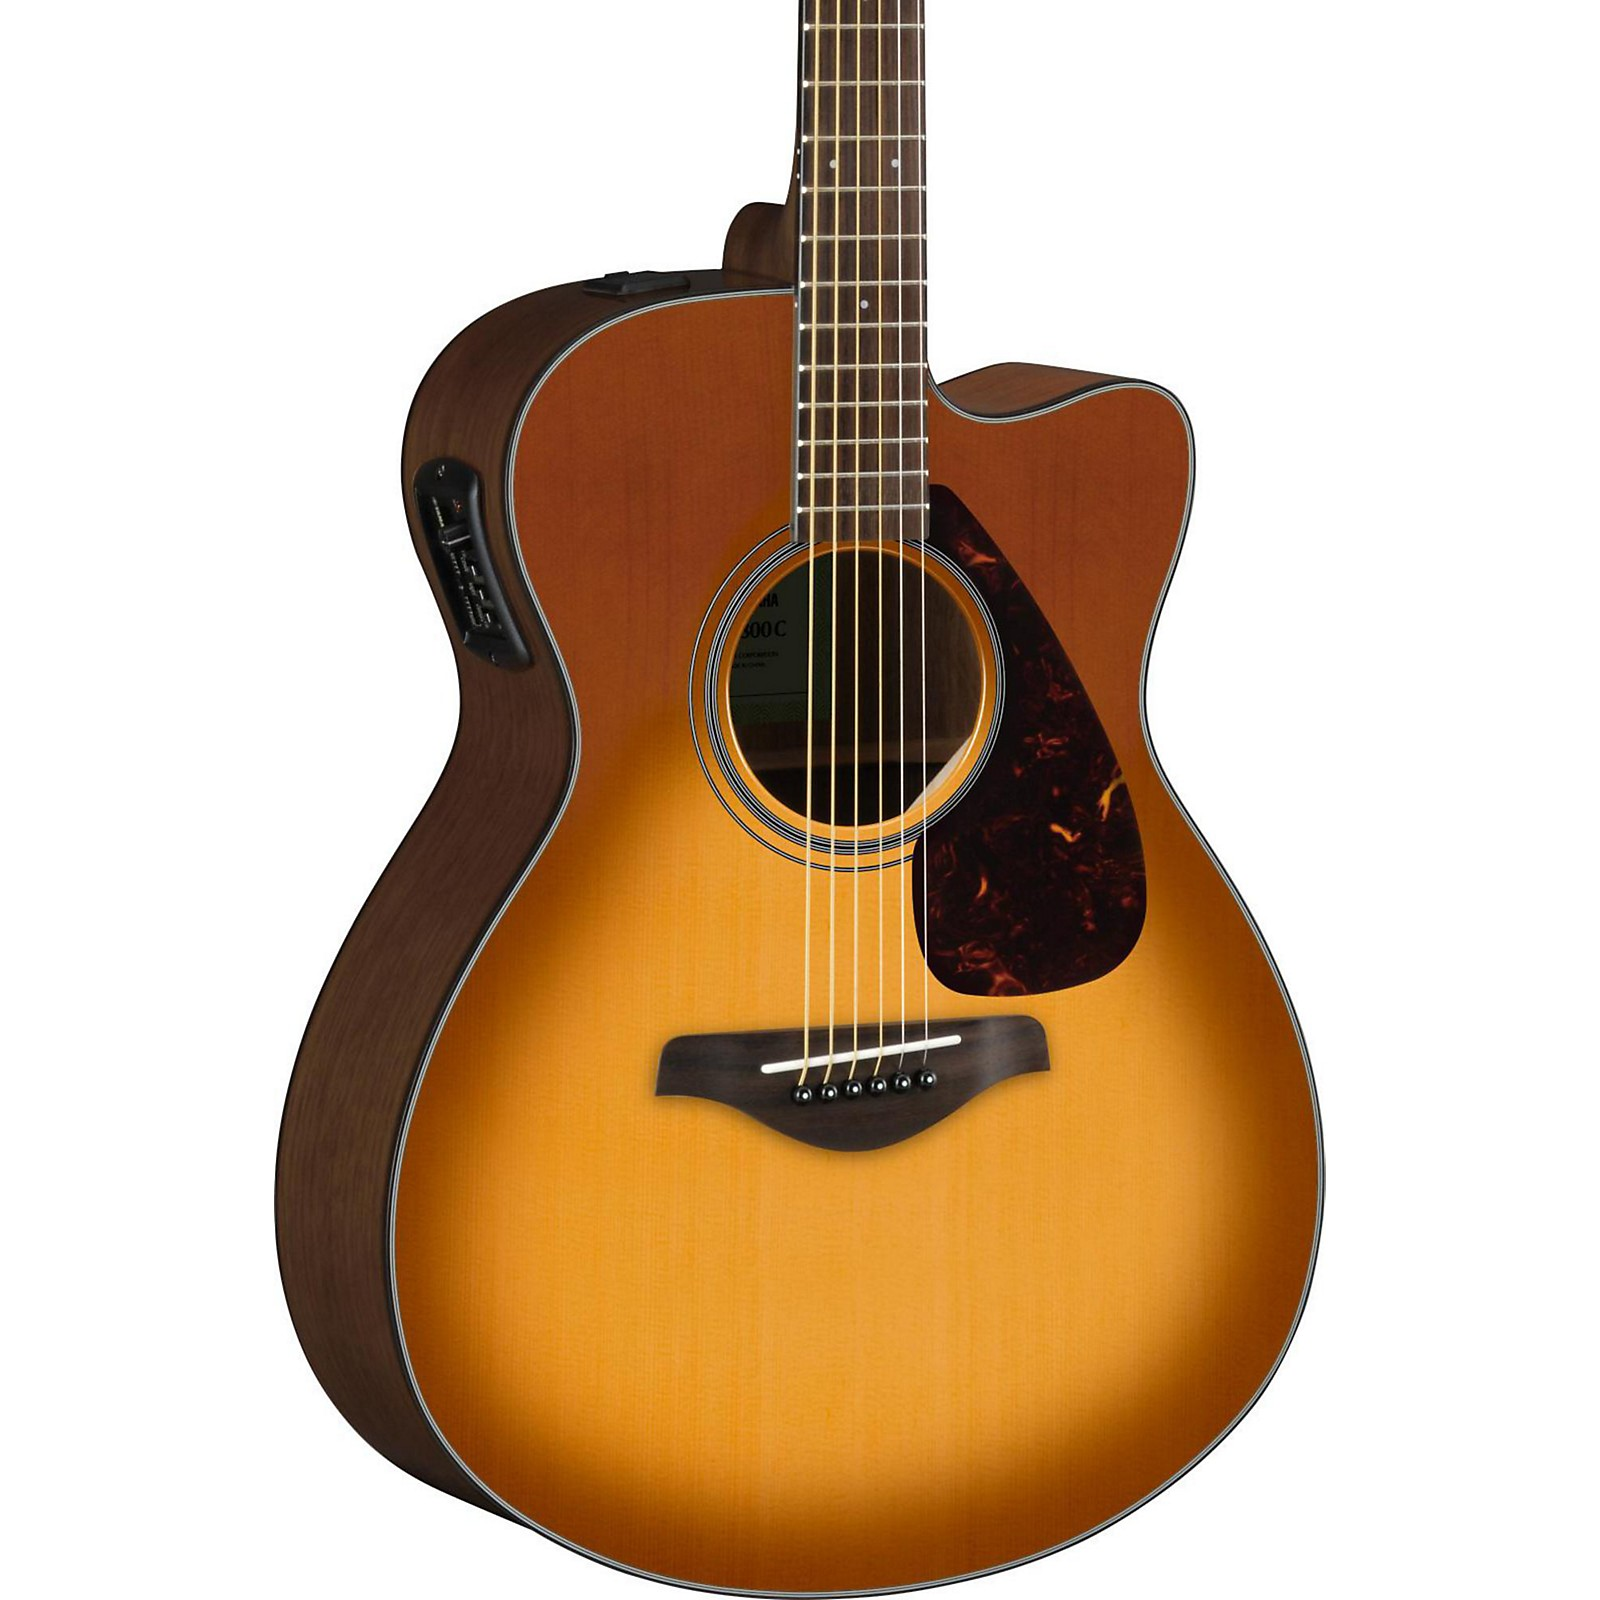 Yamaha Fsx800c Small Body Acoustic Electric Guitar Sand Burst Guitar Center